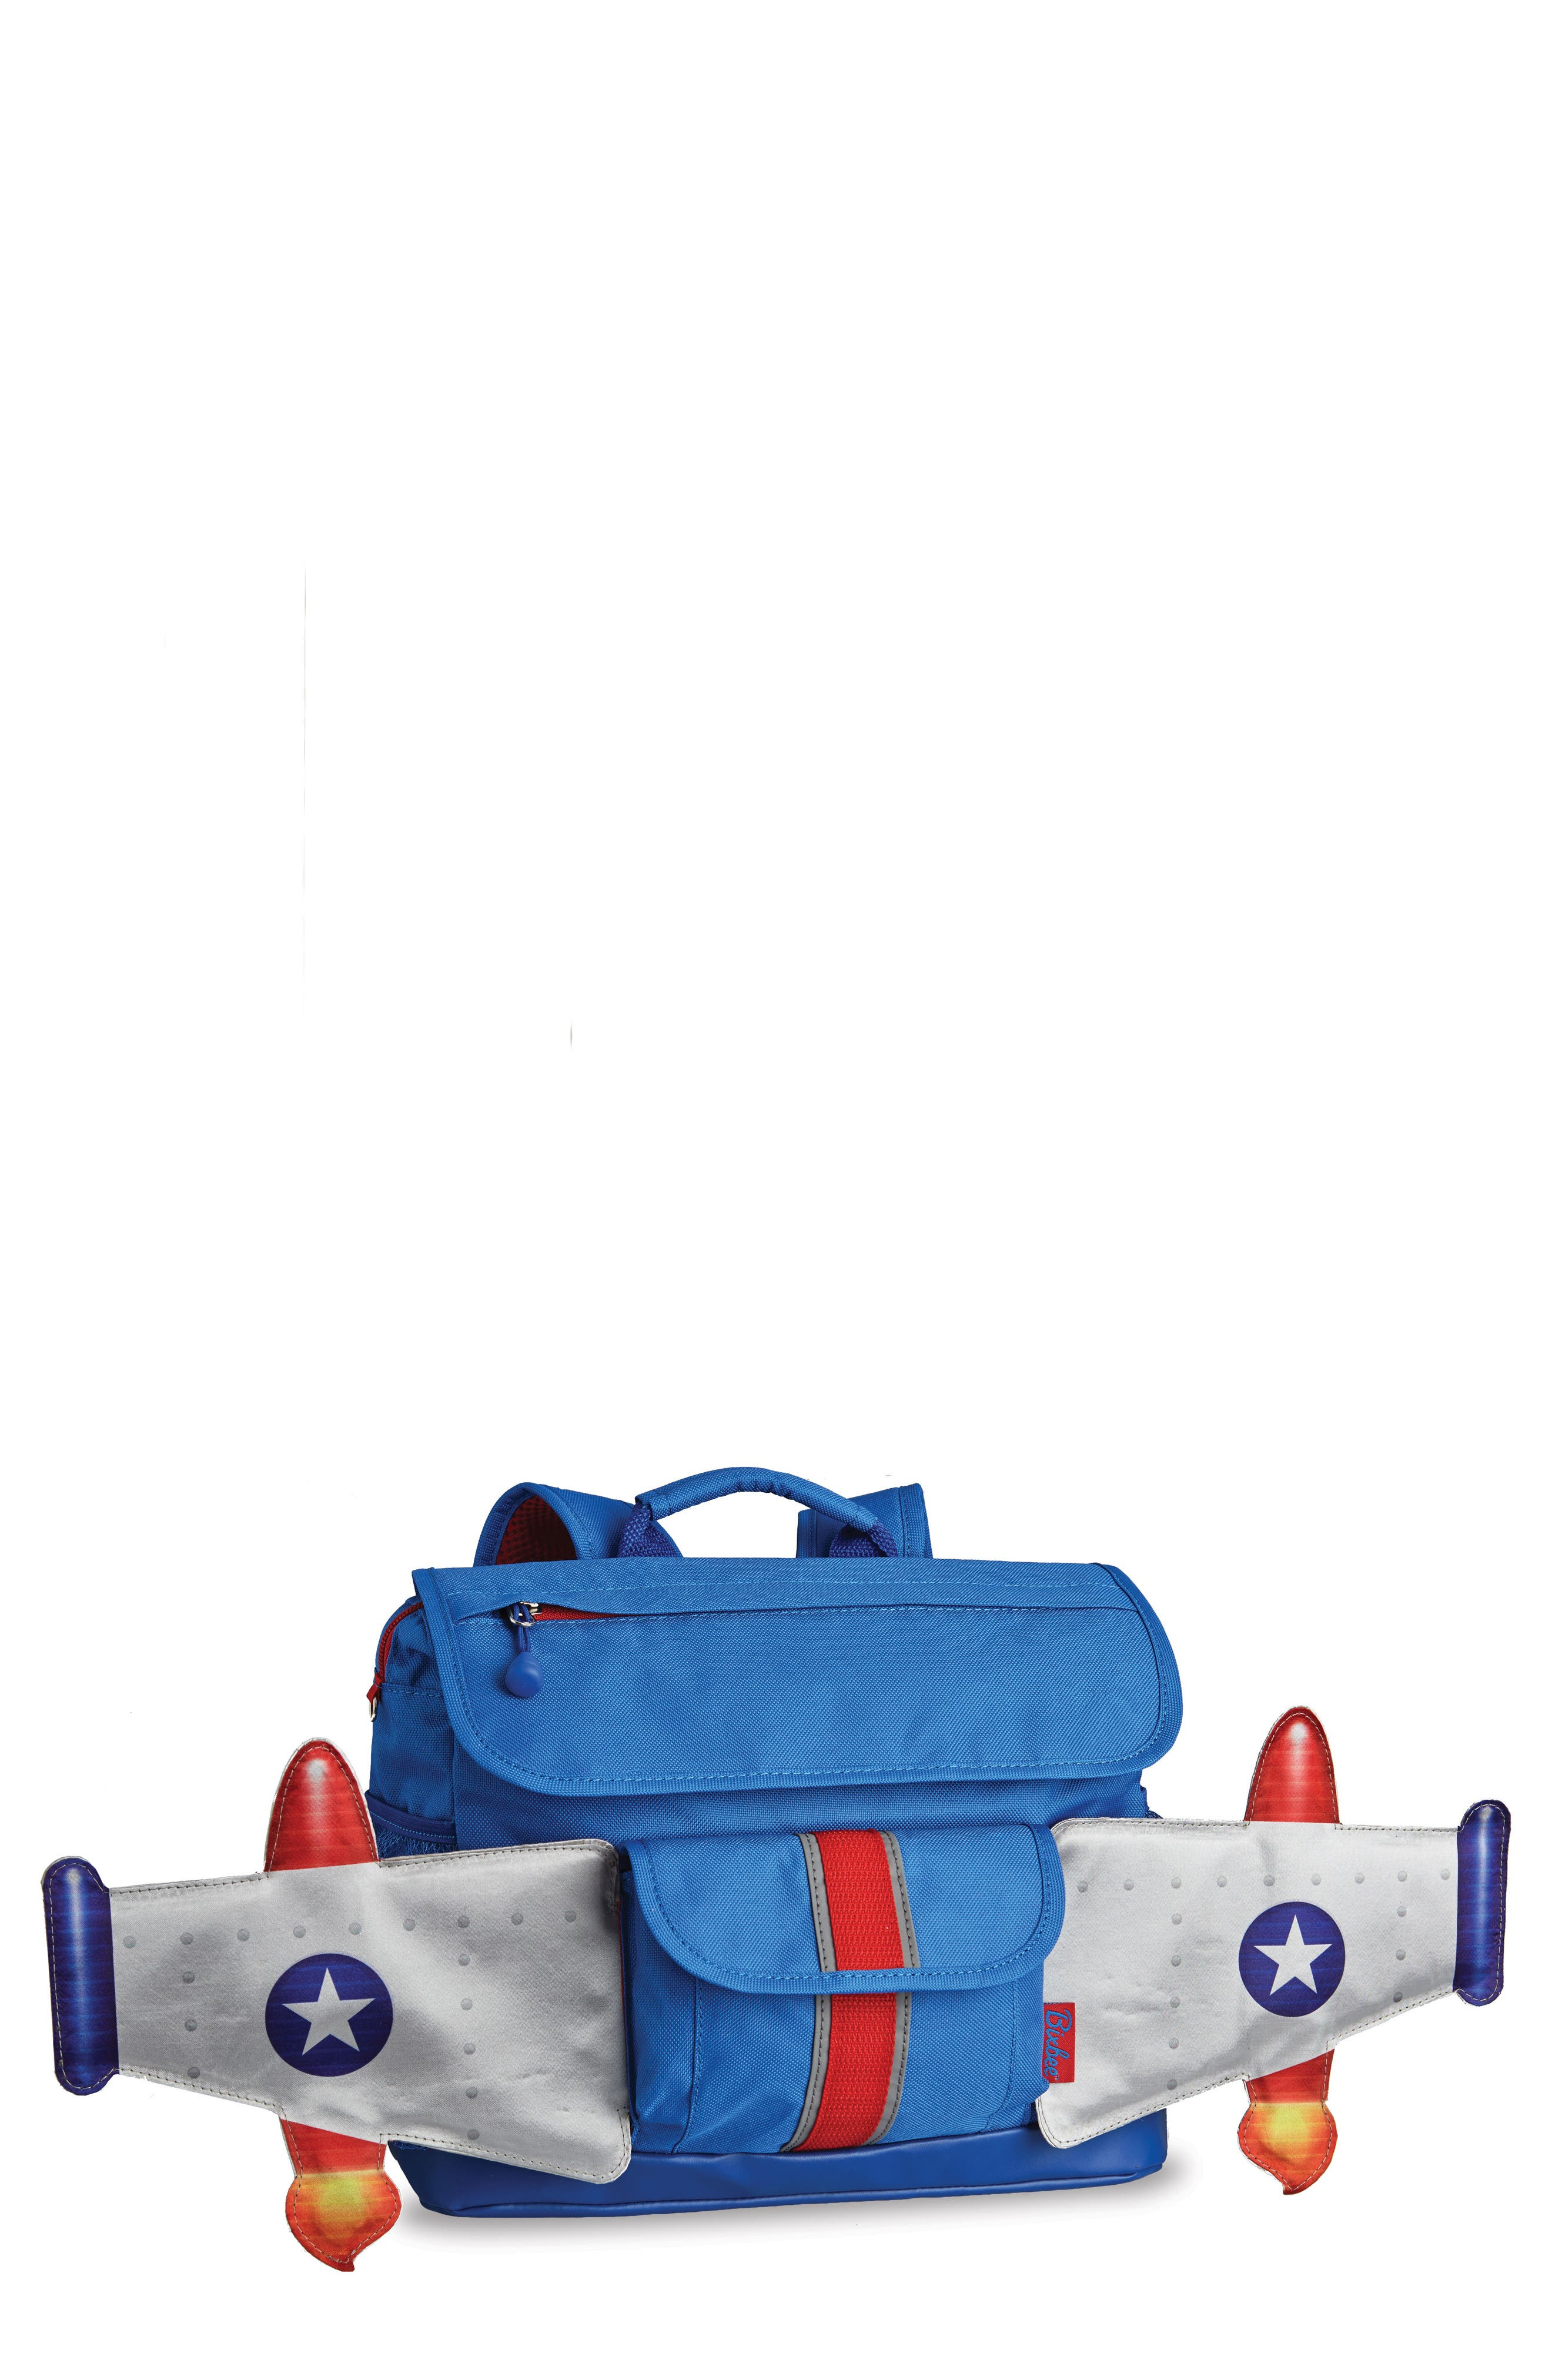 Rocketflyer Water-Resistant Backpack,                             Main thumbnail 1, color,                             400